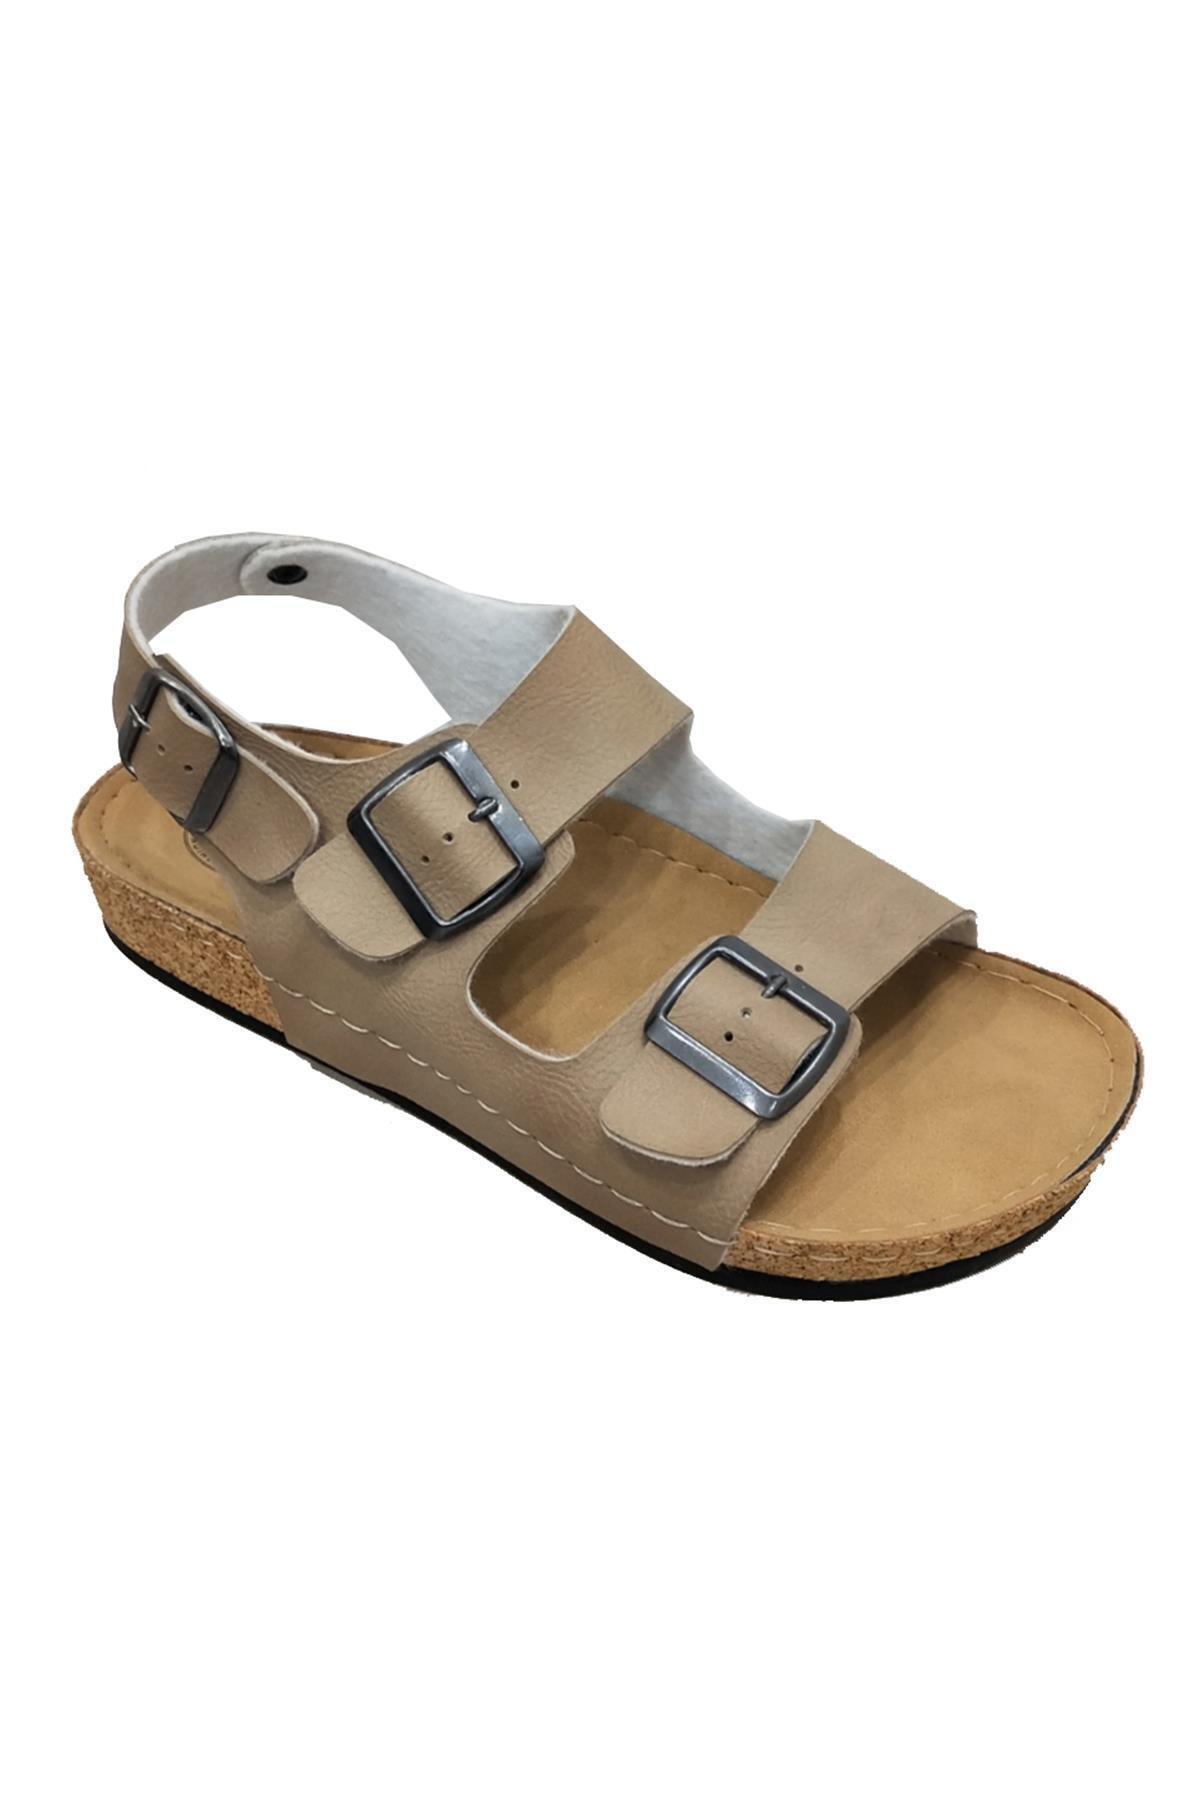 Loris 00928 Ortopedik Anatomik Erkek Sandalet 1